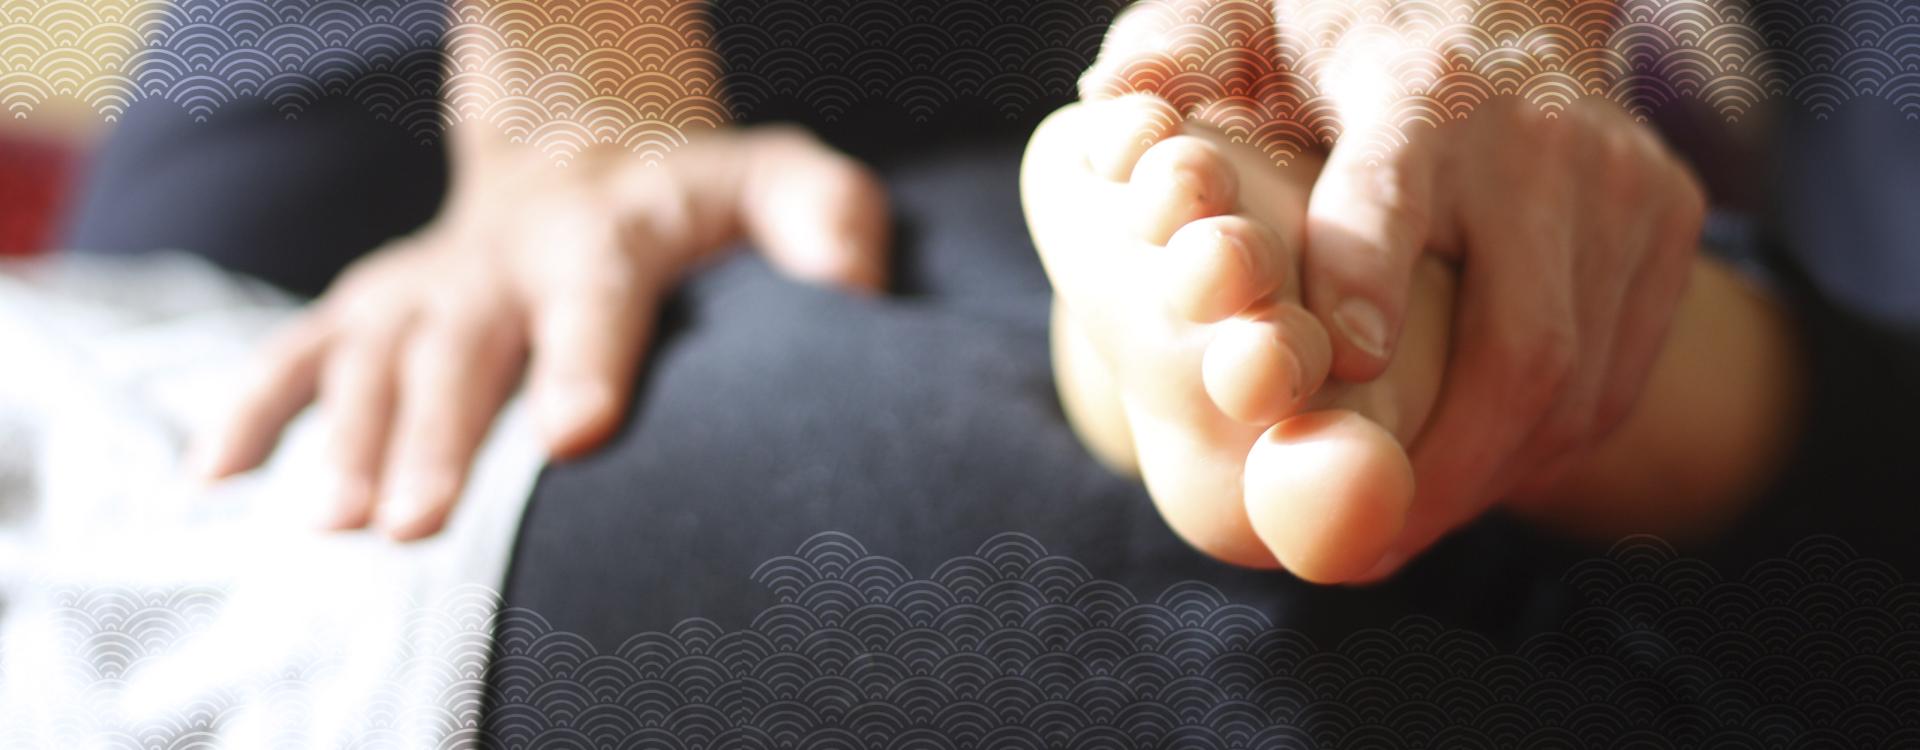 pied-fesse